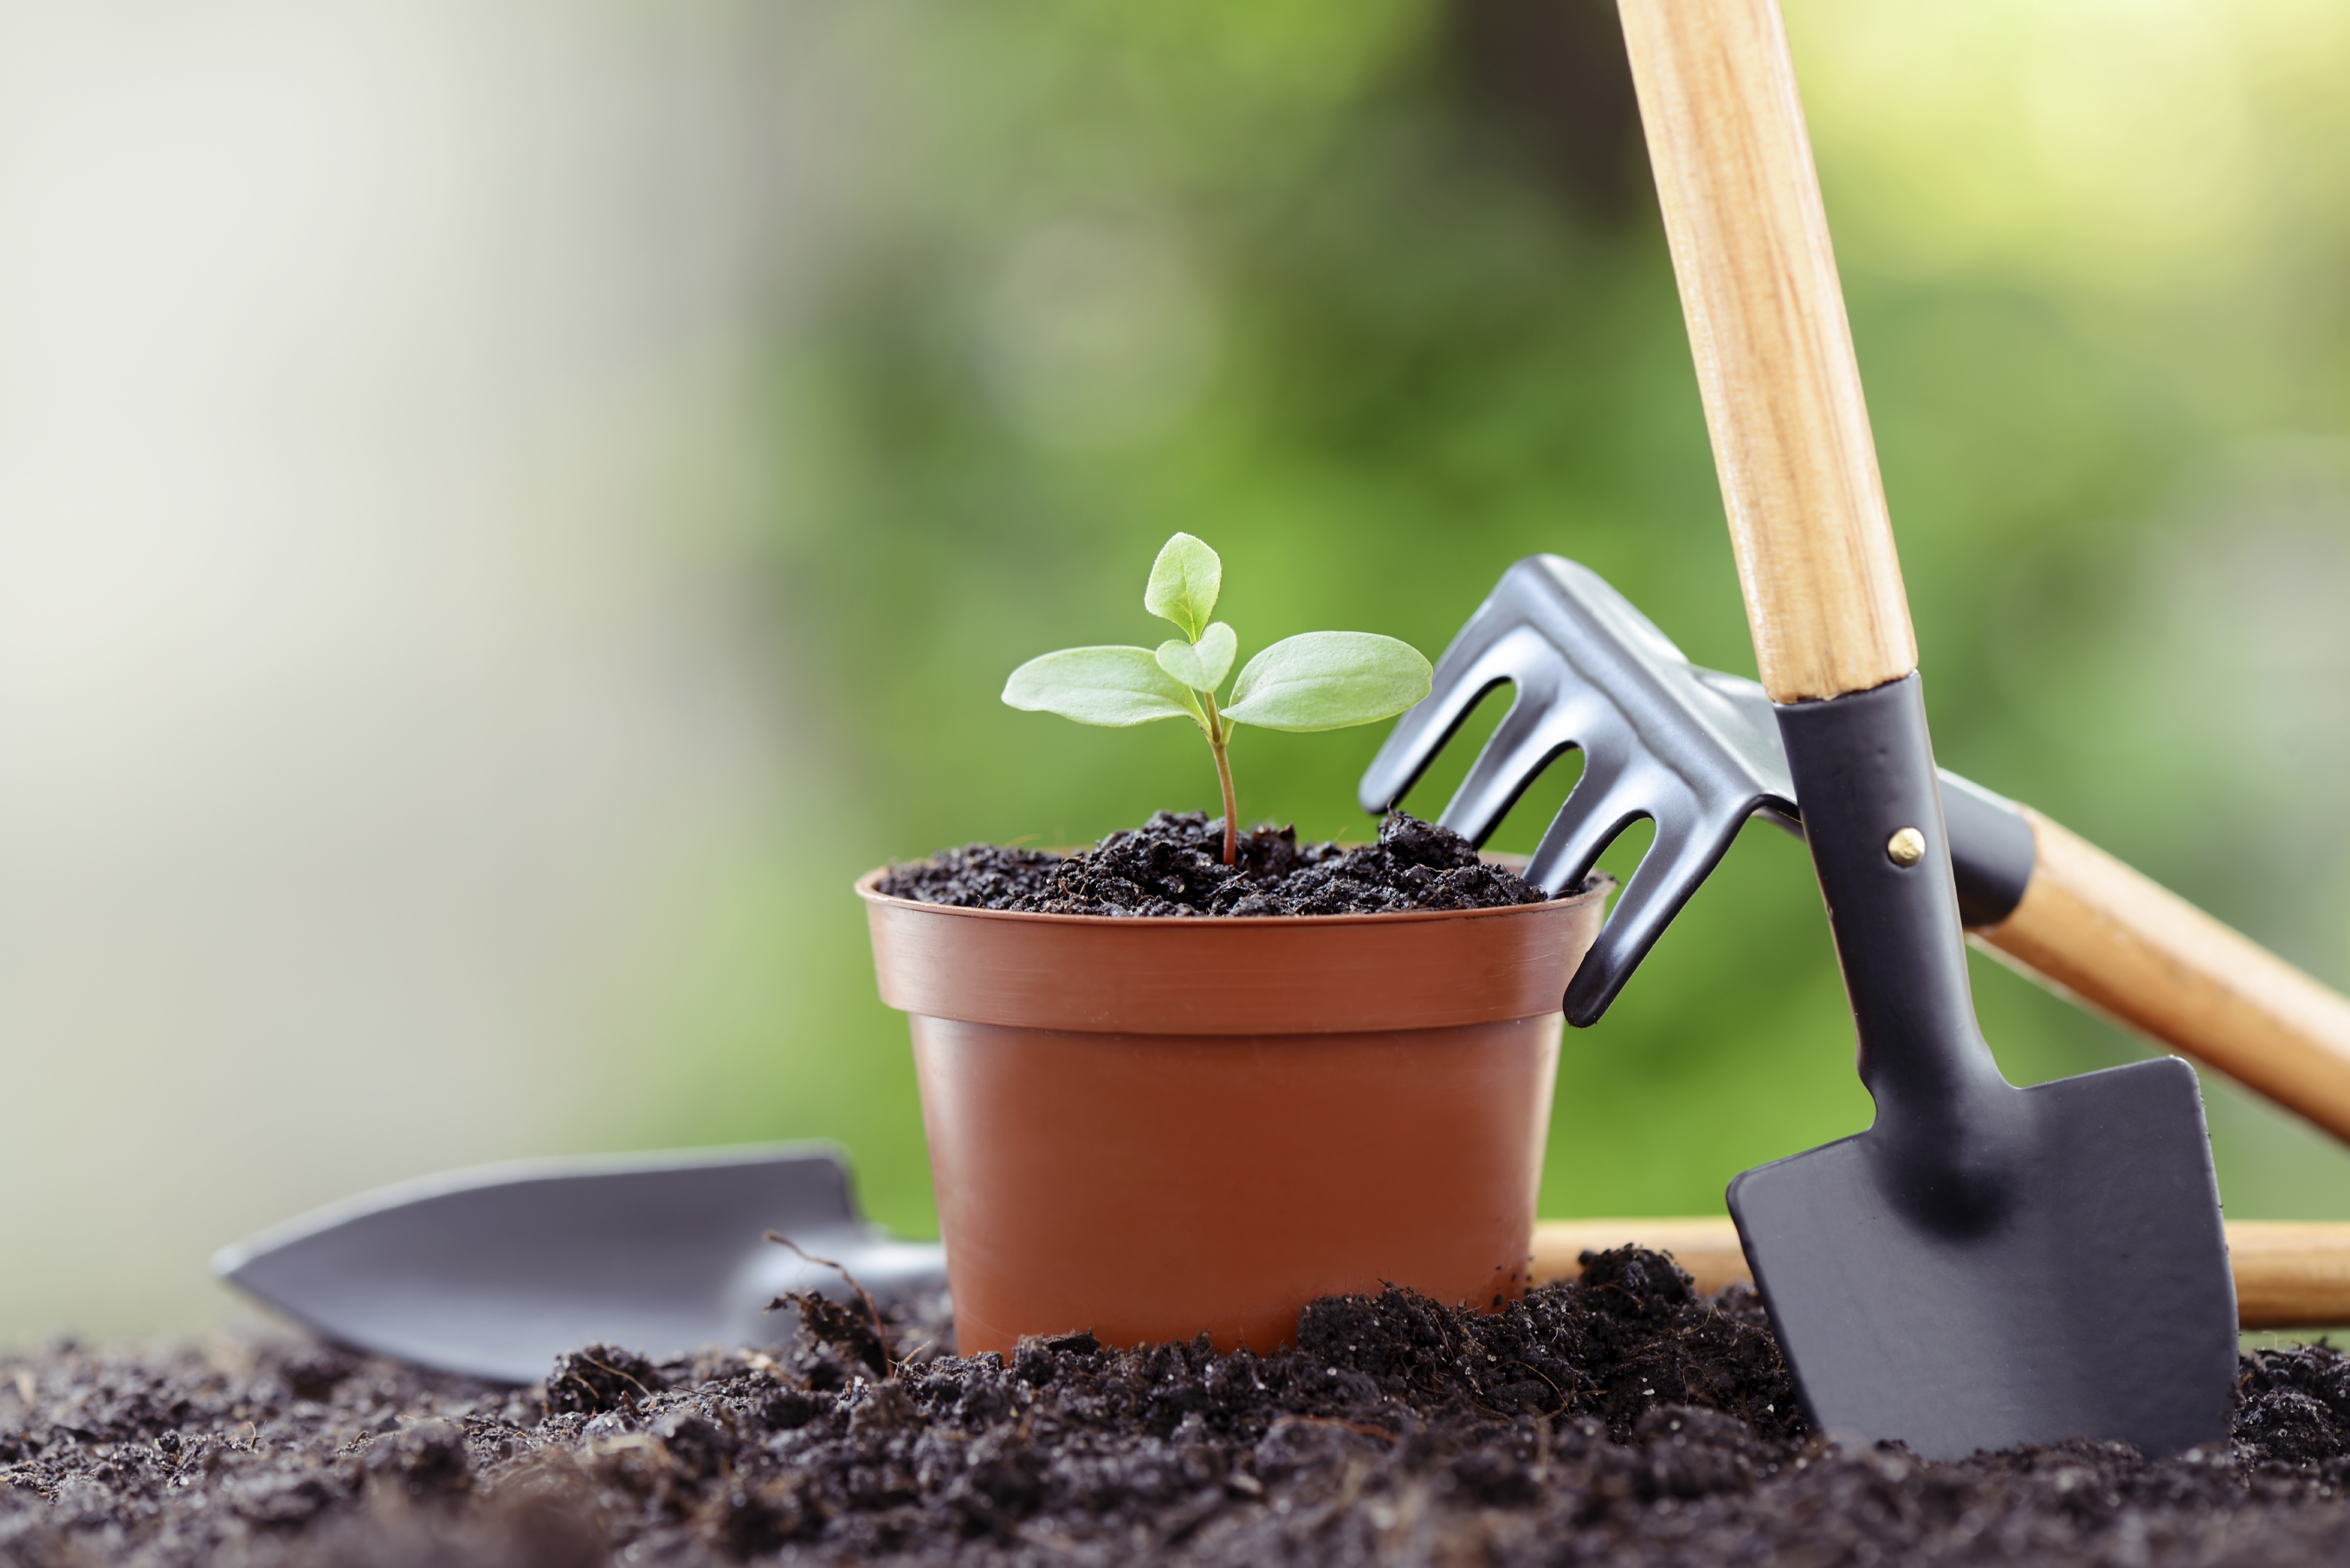 gardening is in, gardening and millennials, garden media group, gardening, planting, working in the garden, gardening is cool, millennials in the garden